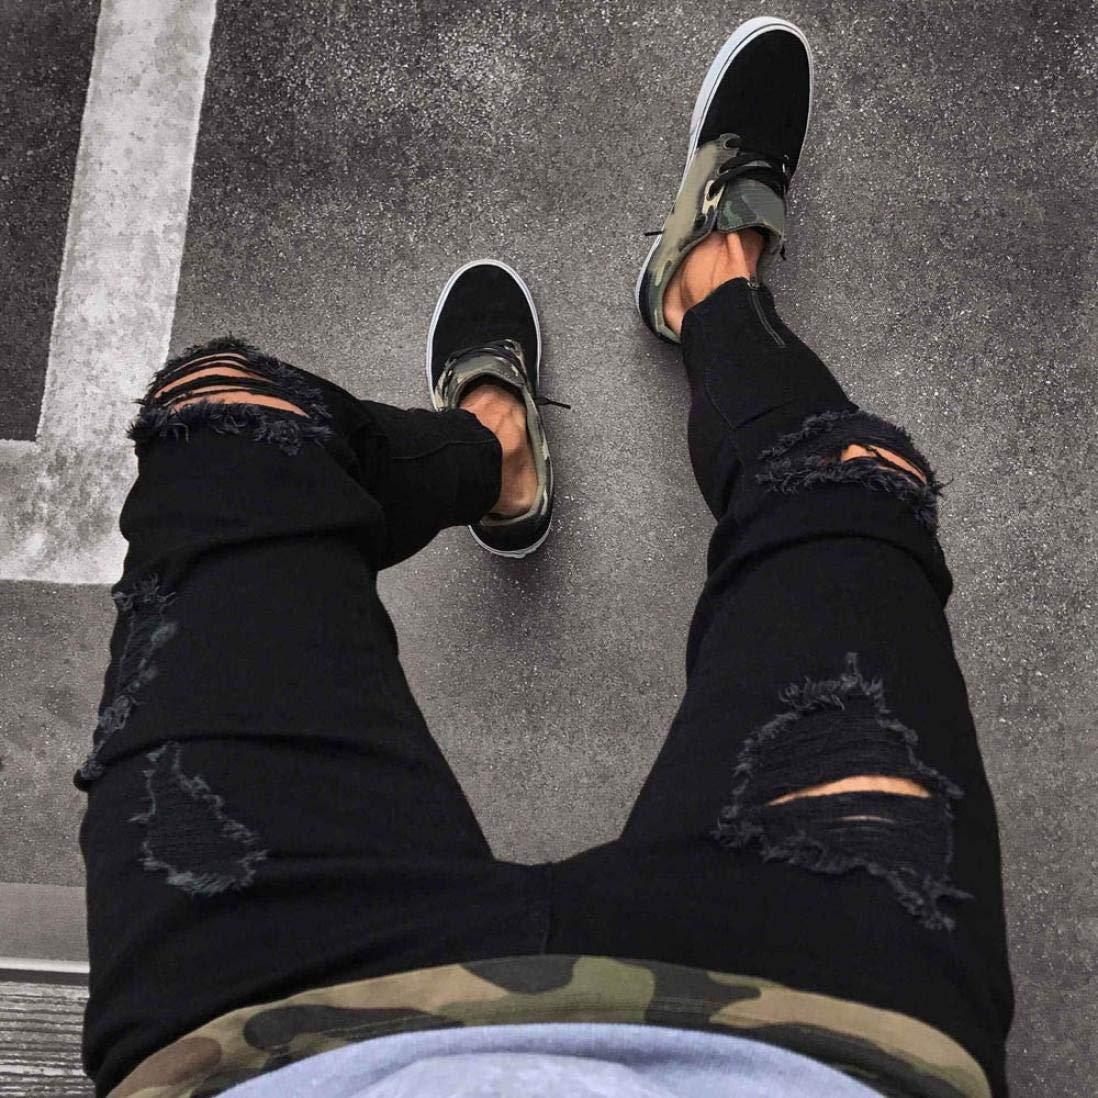 Naturazy Elegantes Jogging Casual Casual Hombre Marca Hombre Slim Biker Zipper Denim Jeans Skinny Frayed Pants Distressed Rip Trousers: Amazon.es: Ropa y ...